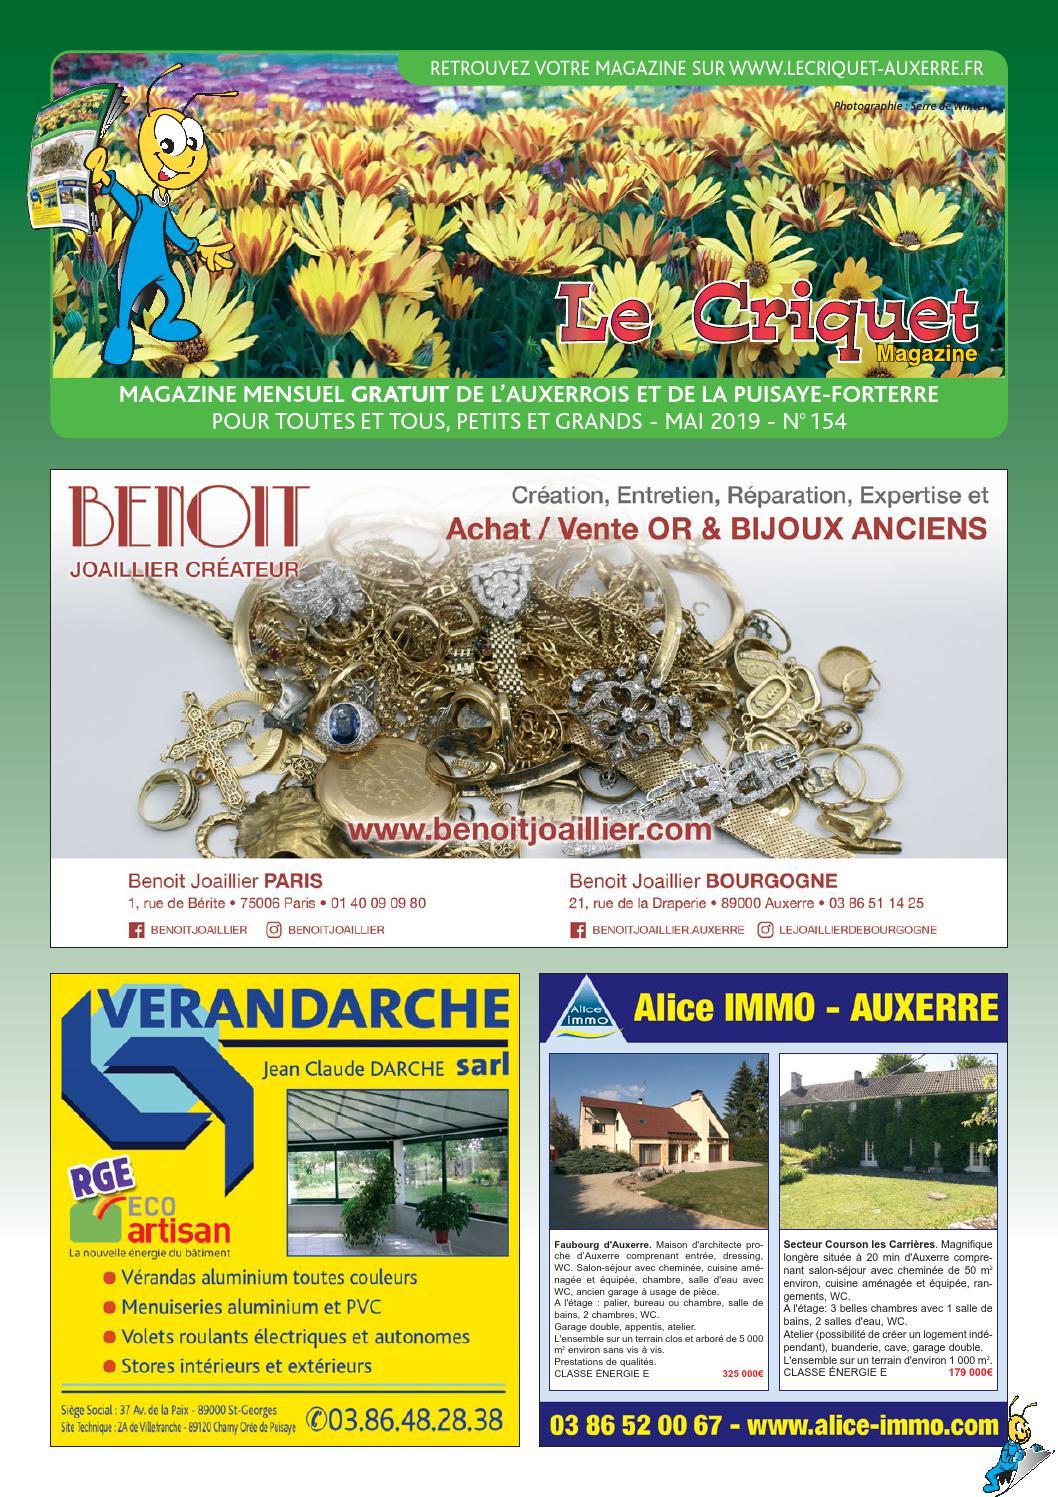 Le Issuu 2019 N°154Mai By Magazine Proxilog Criquet USqVzpM